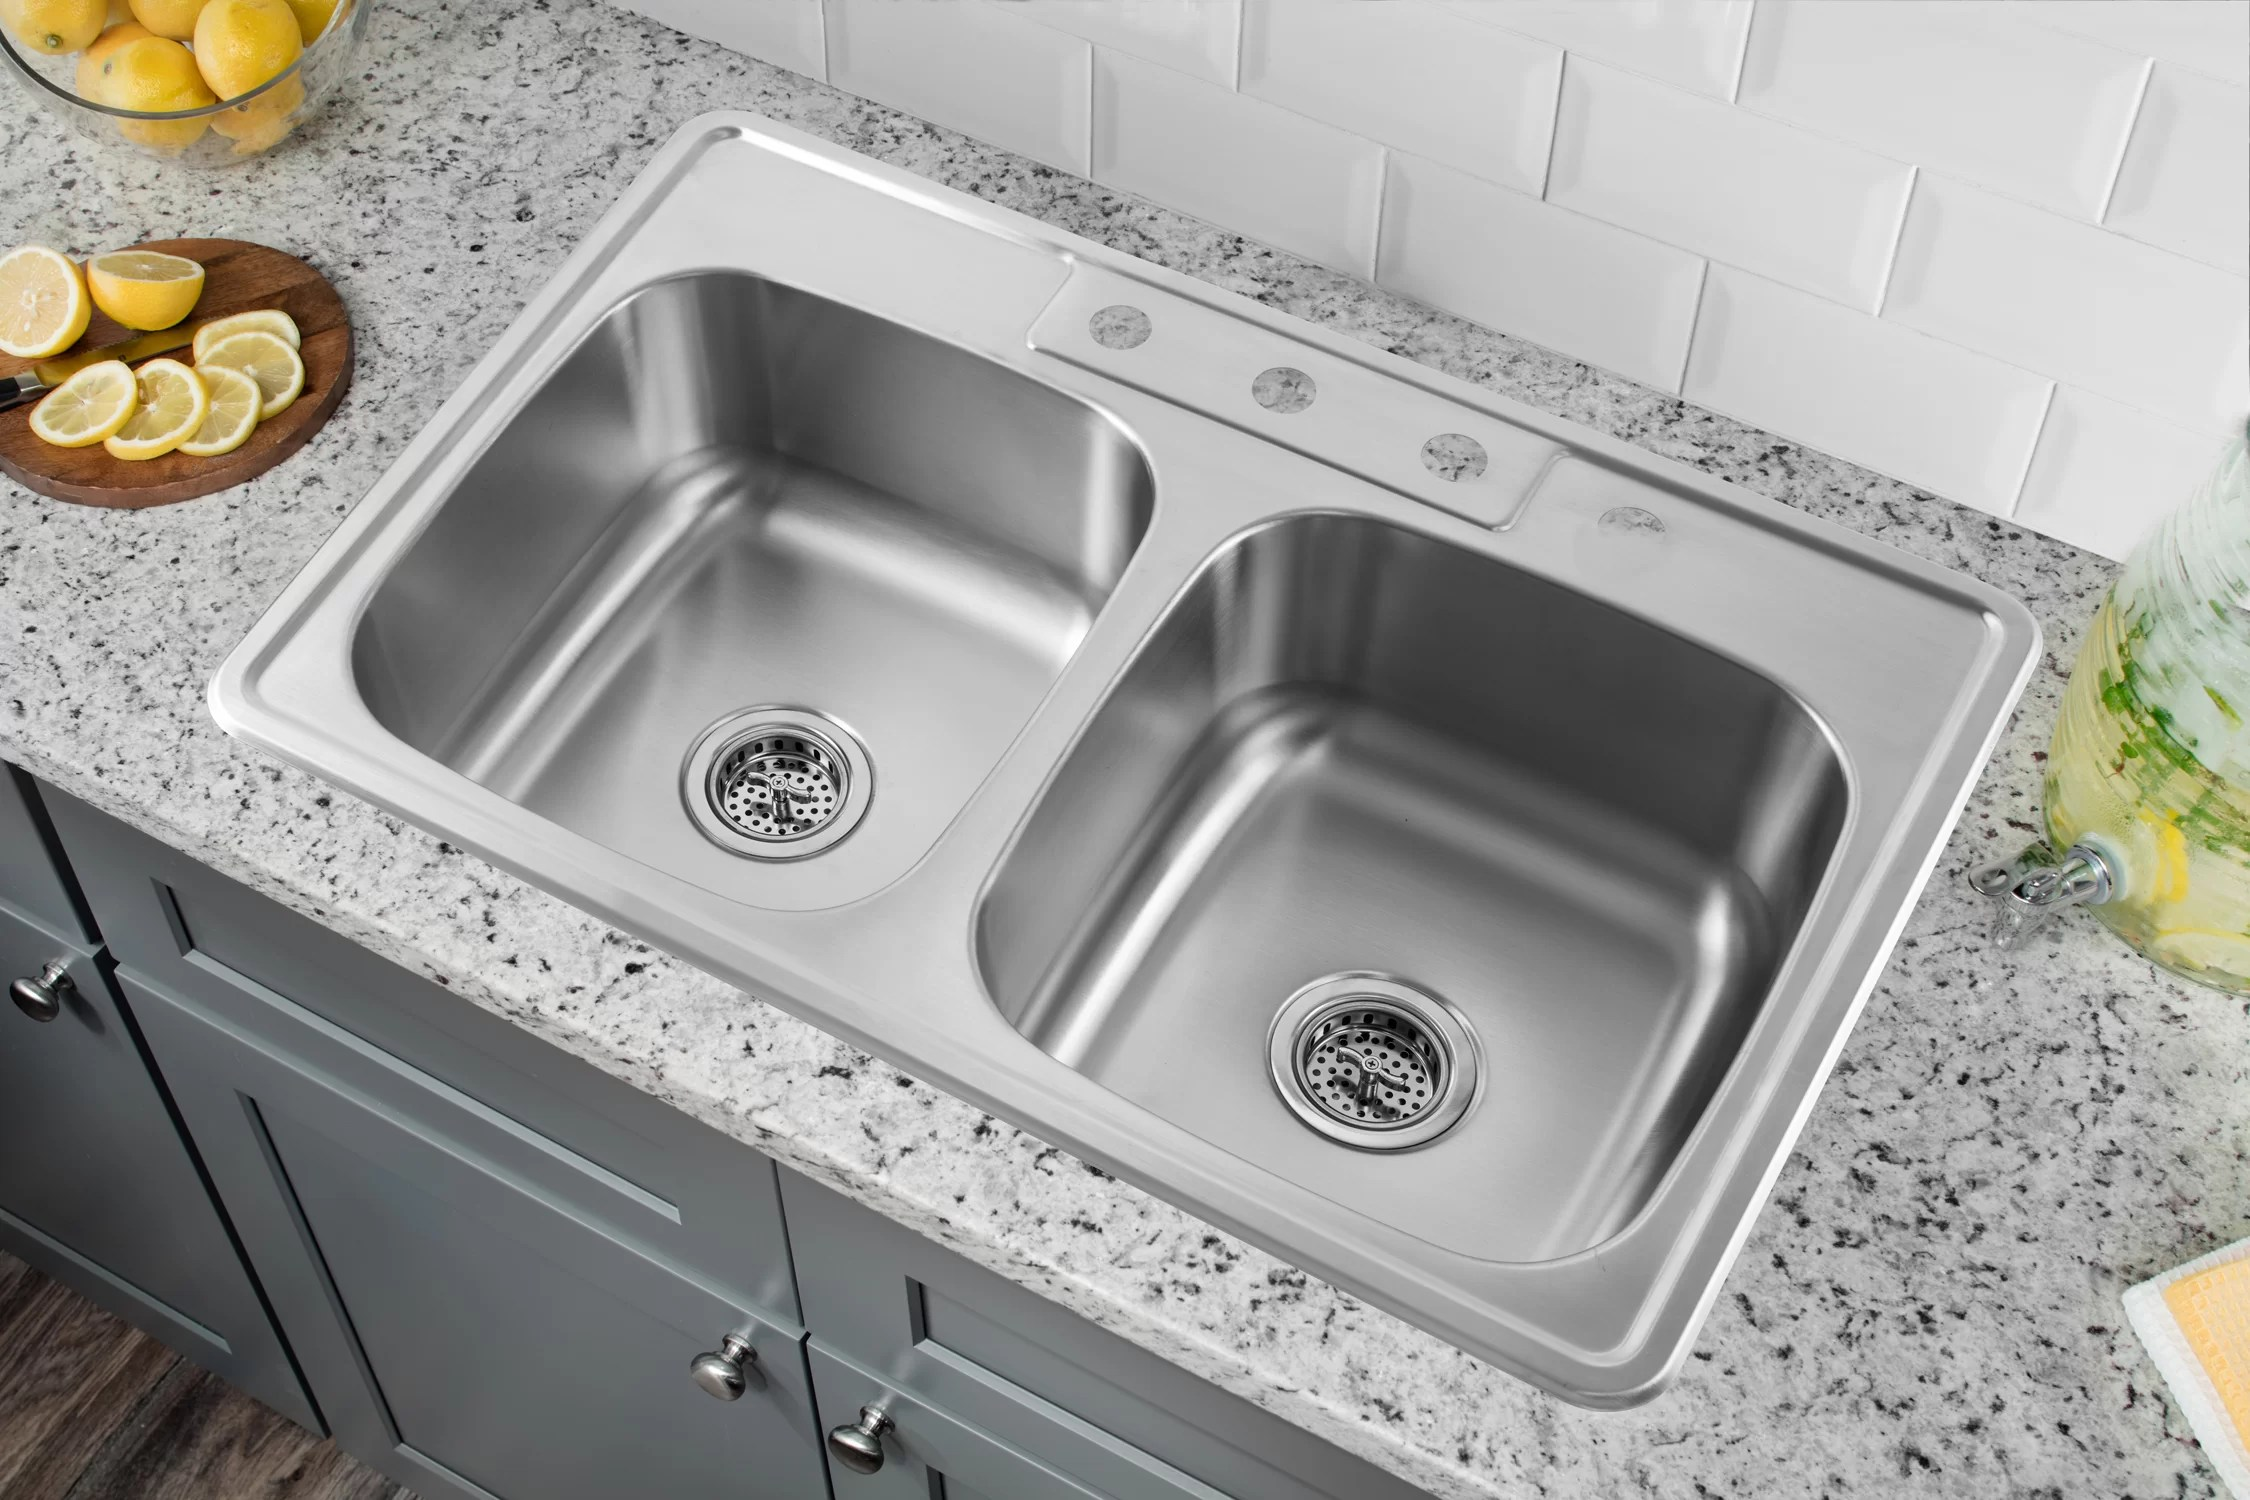 kitchen skins double bowl kitchen sinks stainless steel